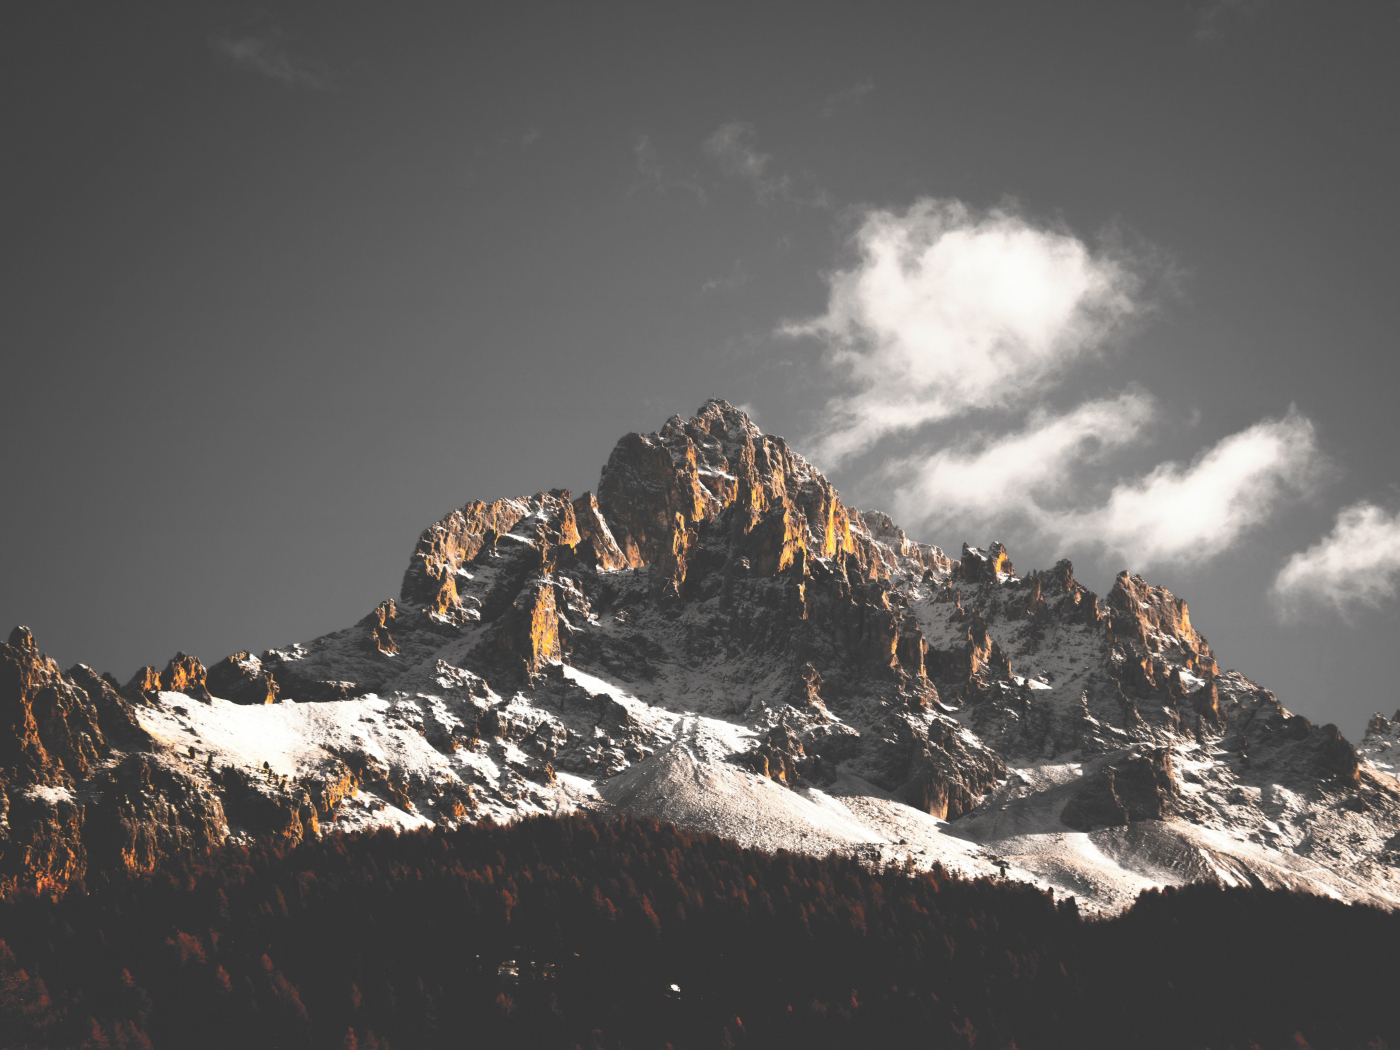 Mountain cliffs, nature, sky, clouds, tree, 1400x1050 wallpaper